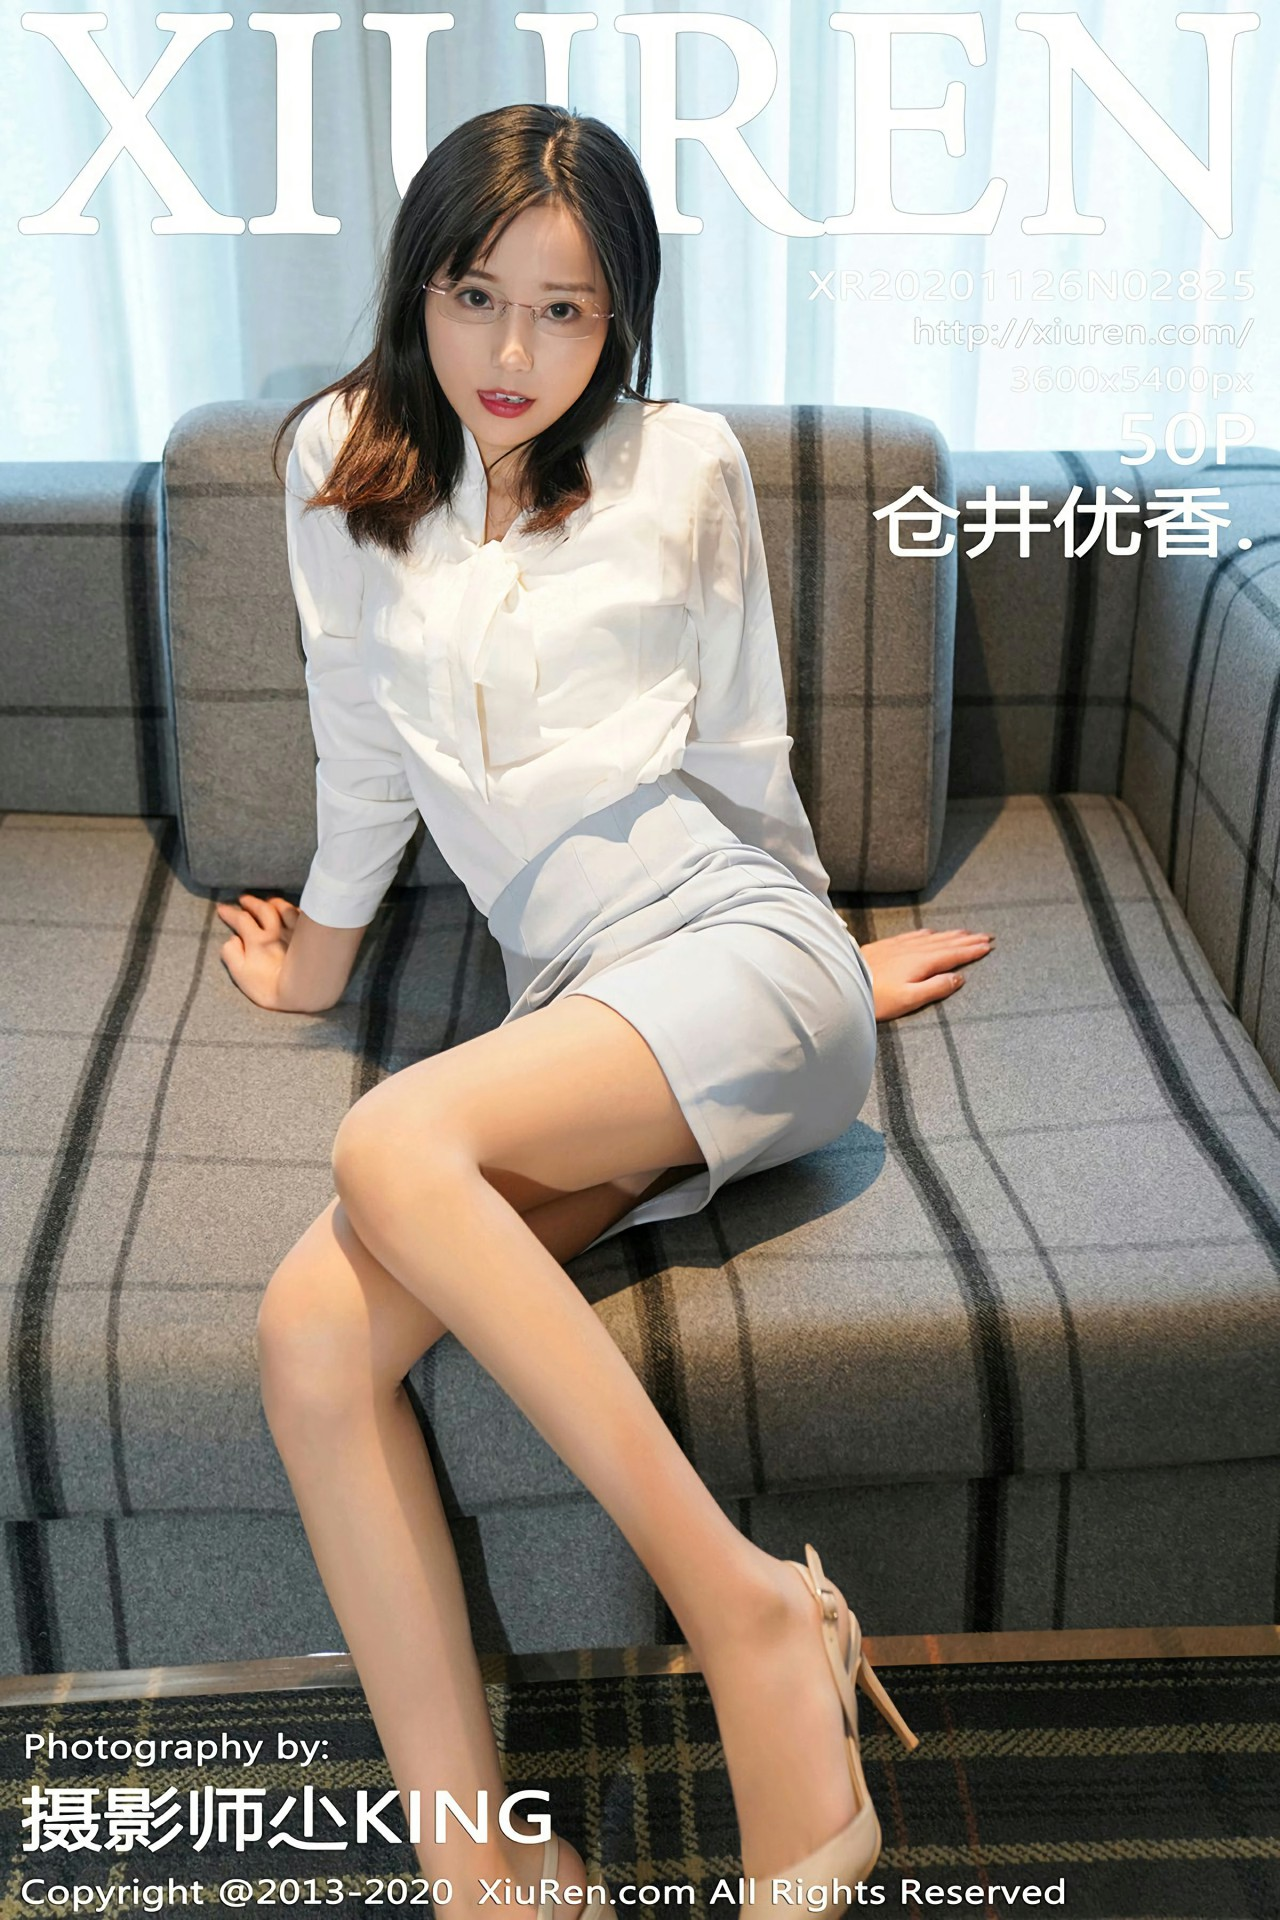 [XiuRen秀人网] 2020.11.26 No.2825 仓井优香 第1张